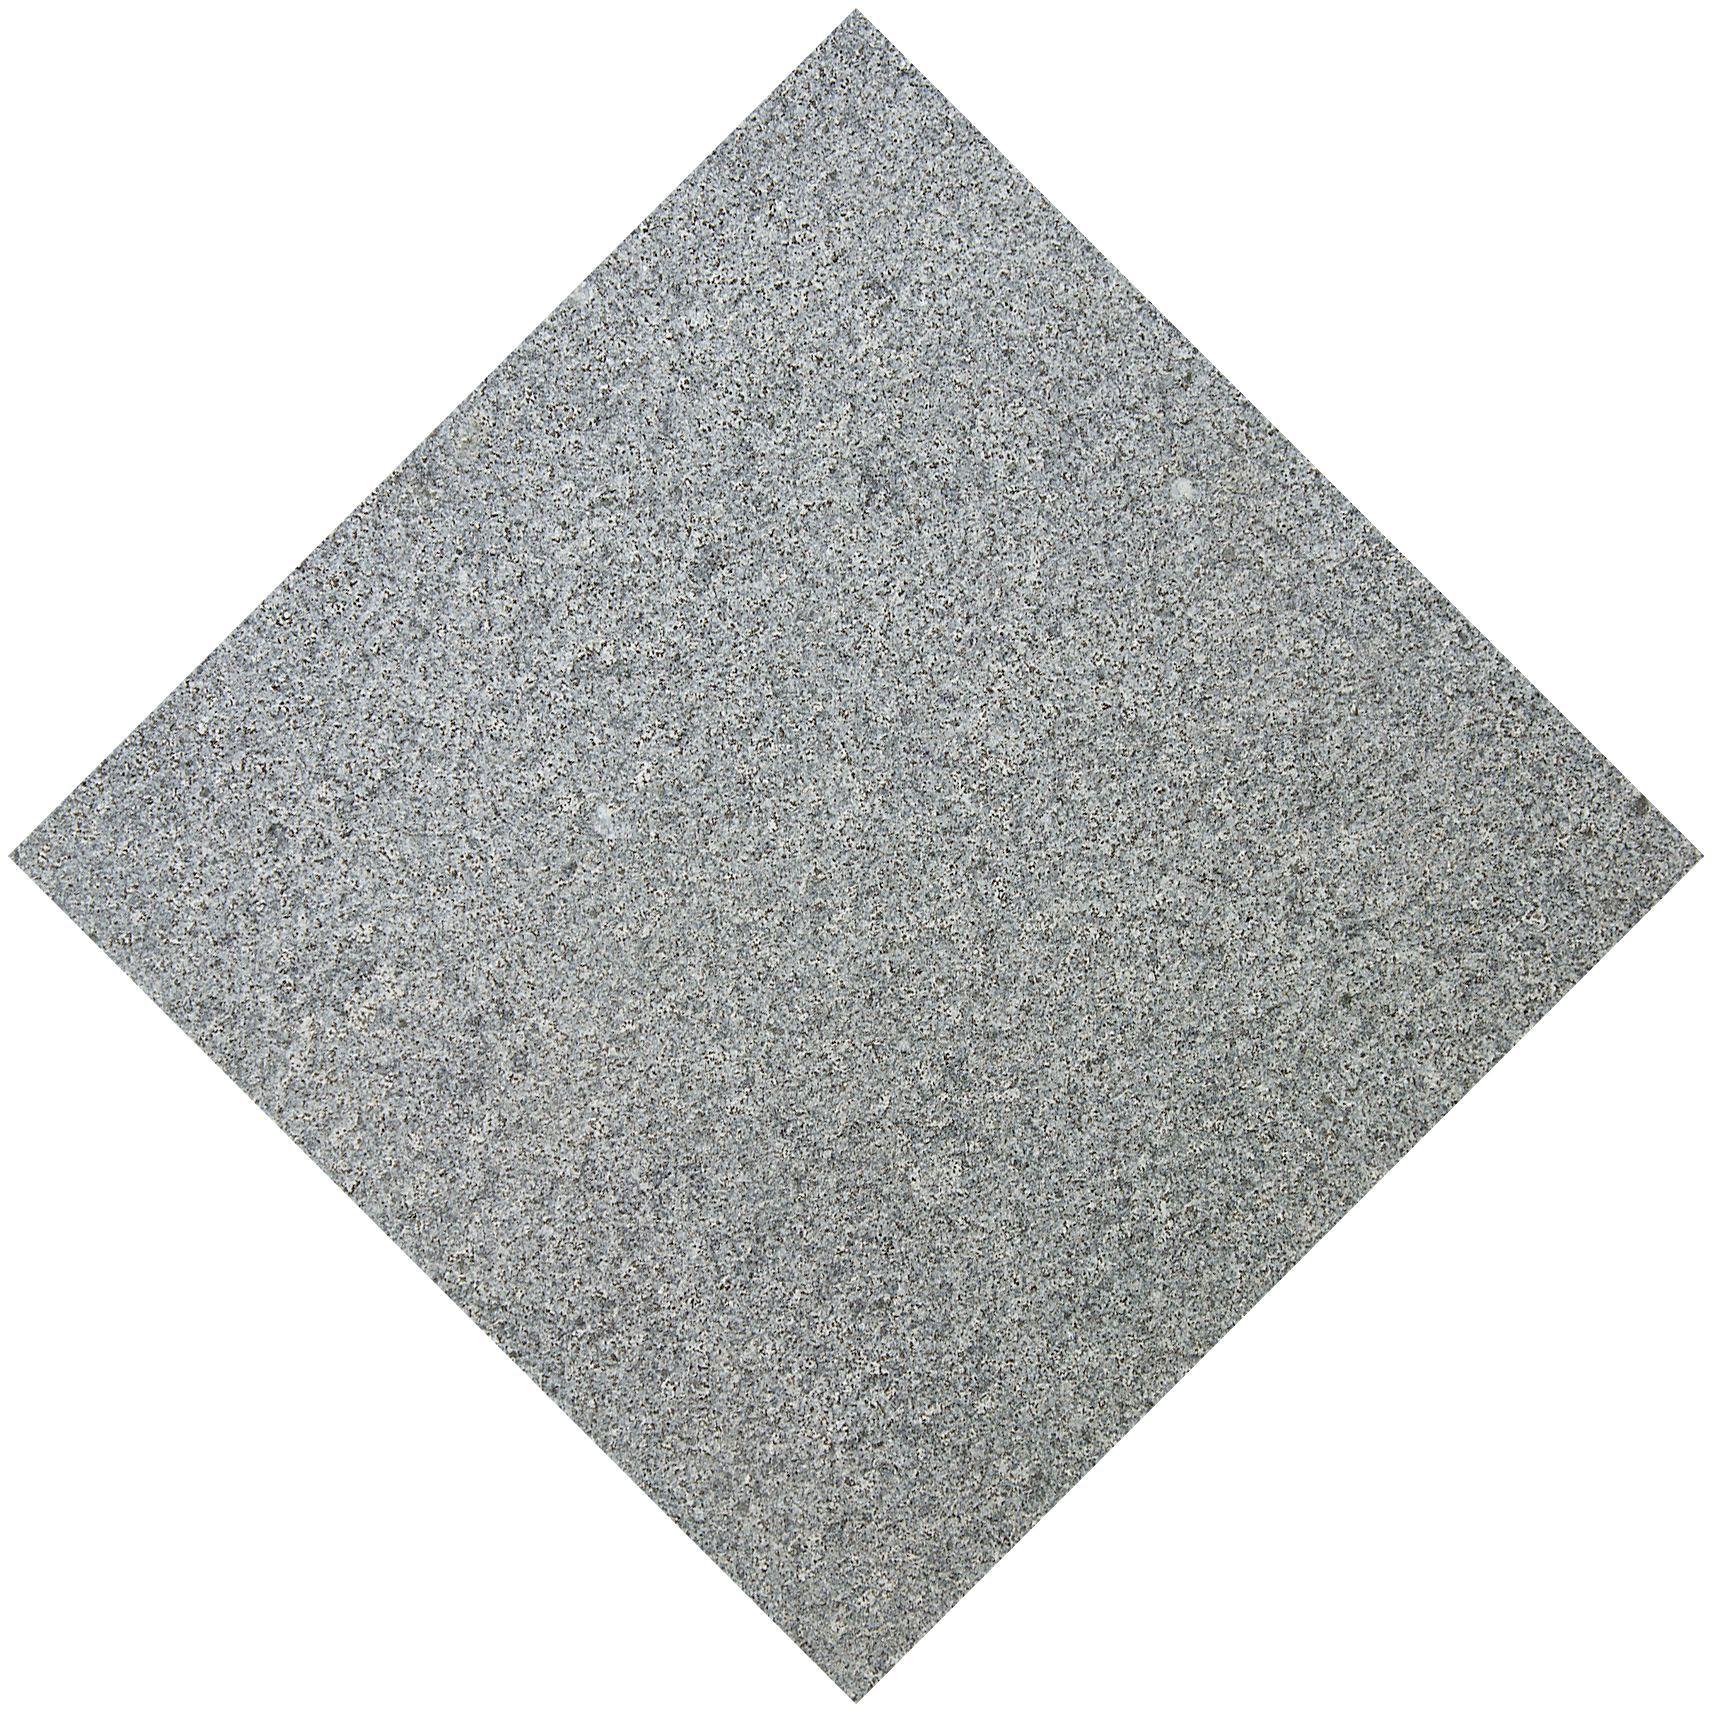 Midnight Grey Natural Granite Paving Slab (l)900 (w)900mm Pack Of 18